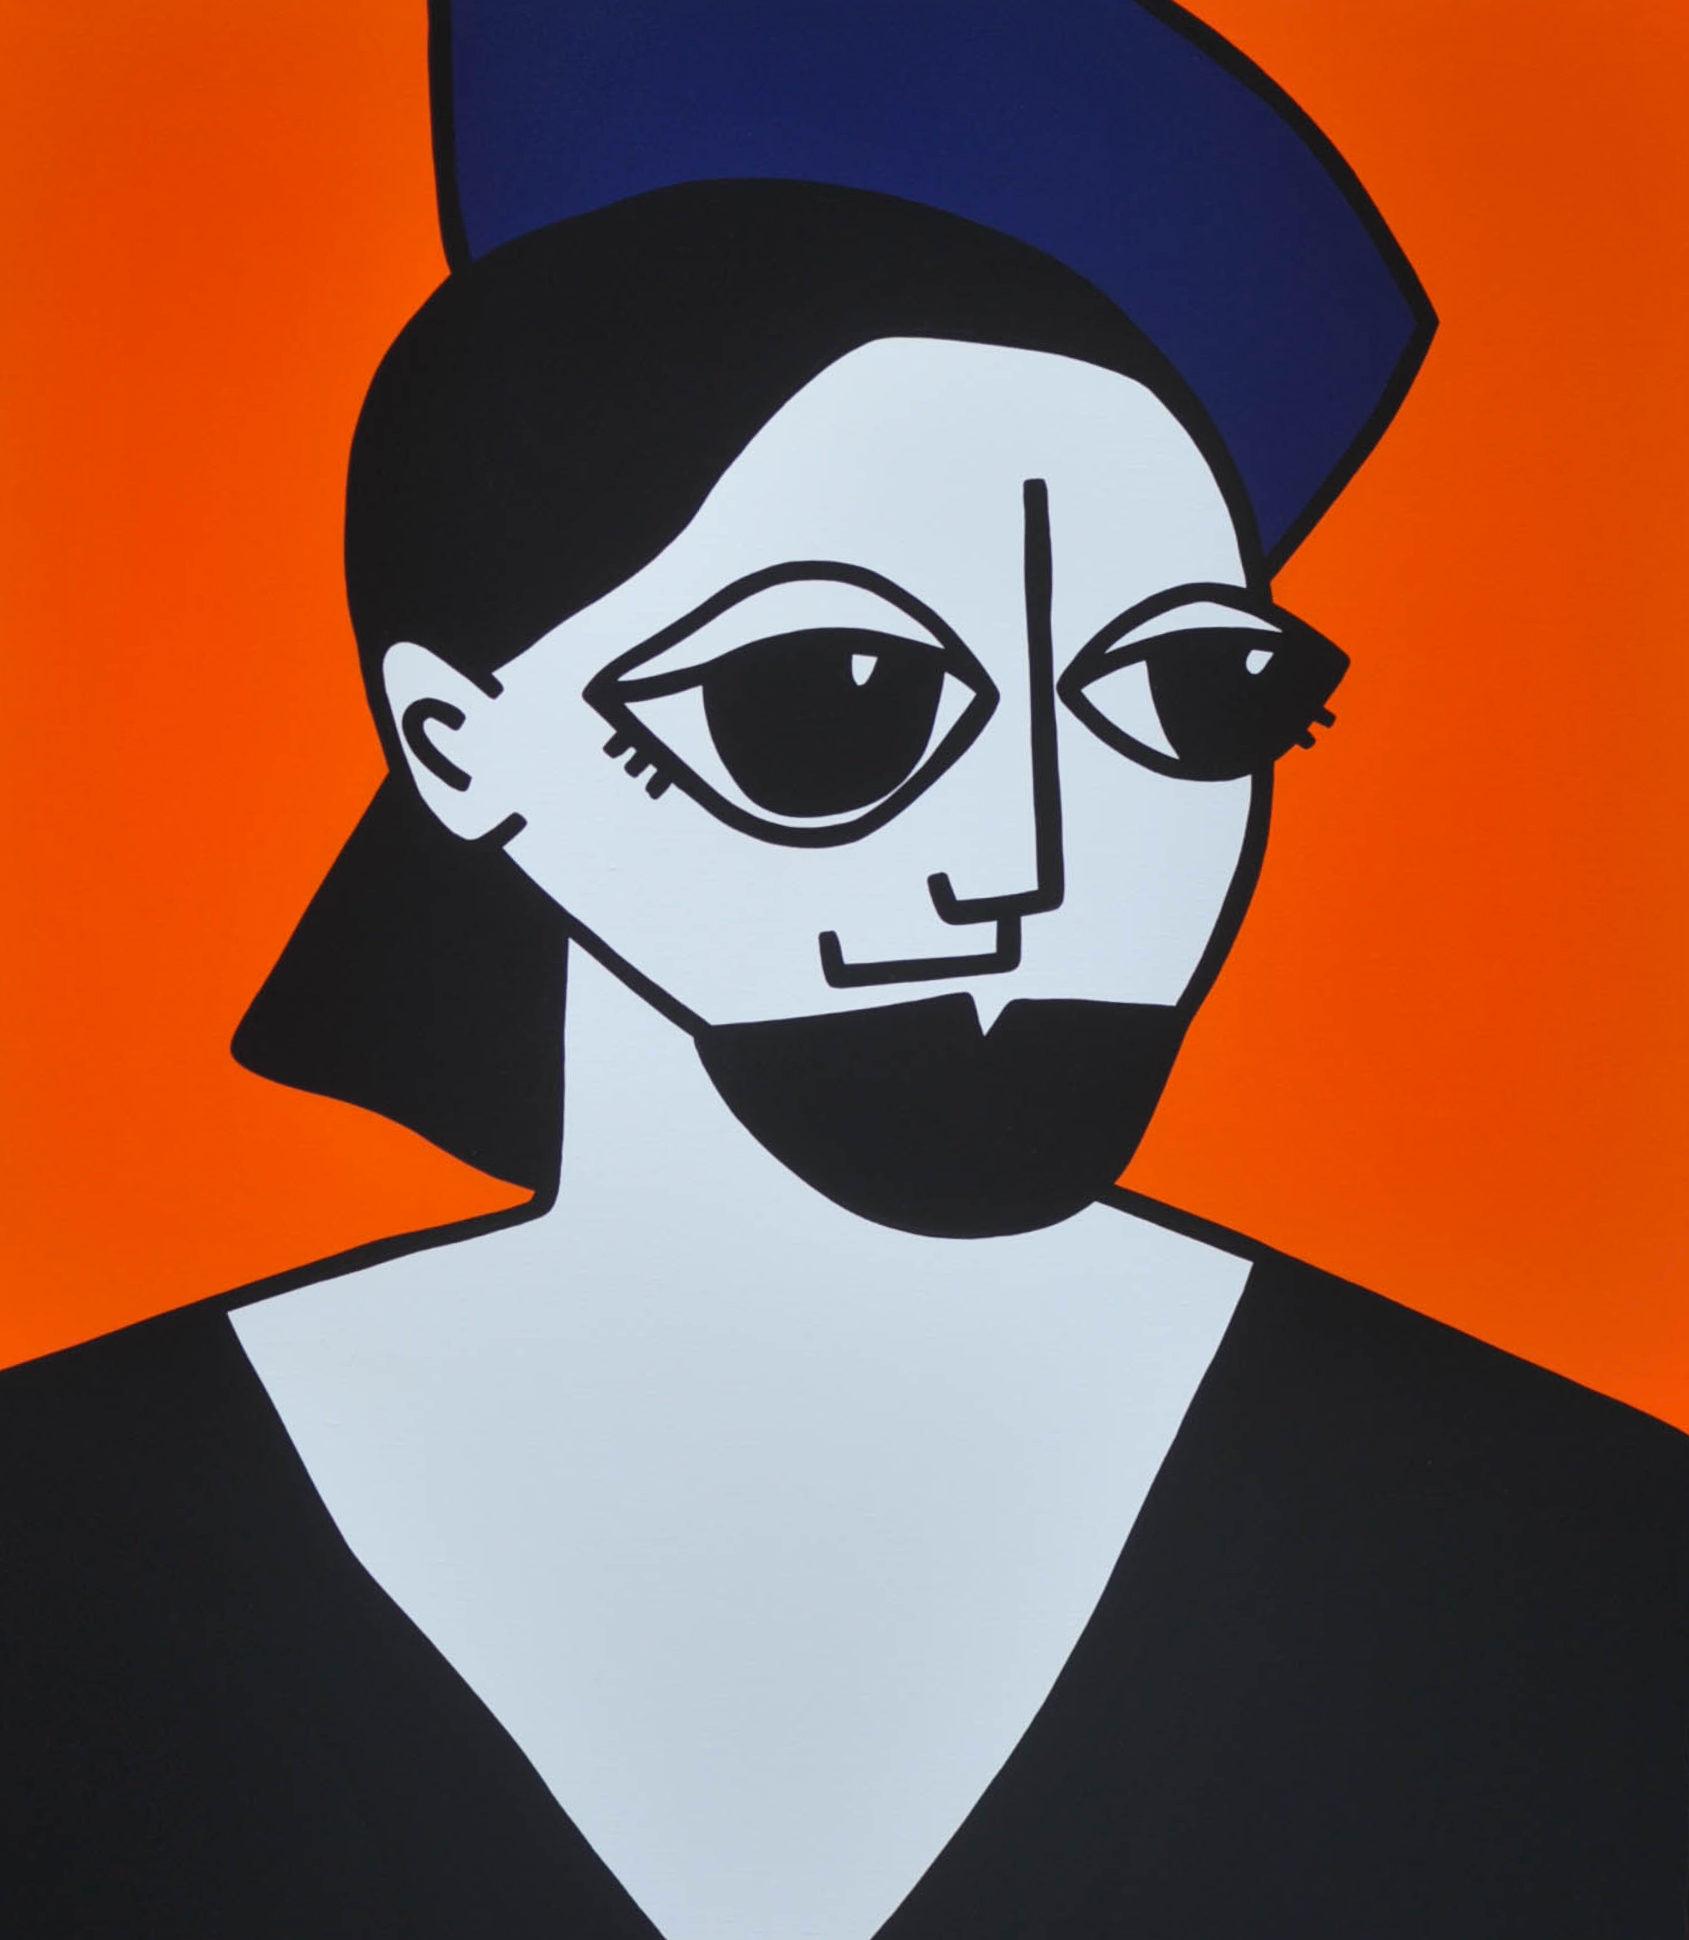 RedLips-figuration libre marseillaise-jeune artiste marseillaise-follow your dreams-jeune talent artistique-galerie art marseille